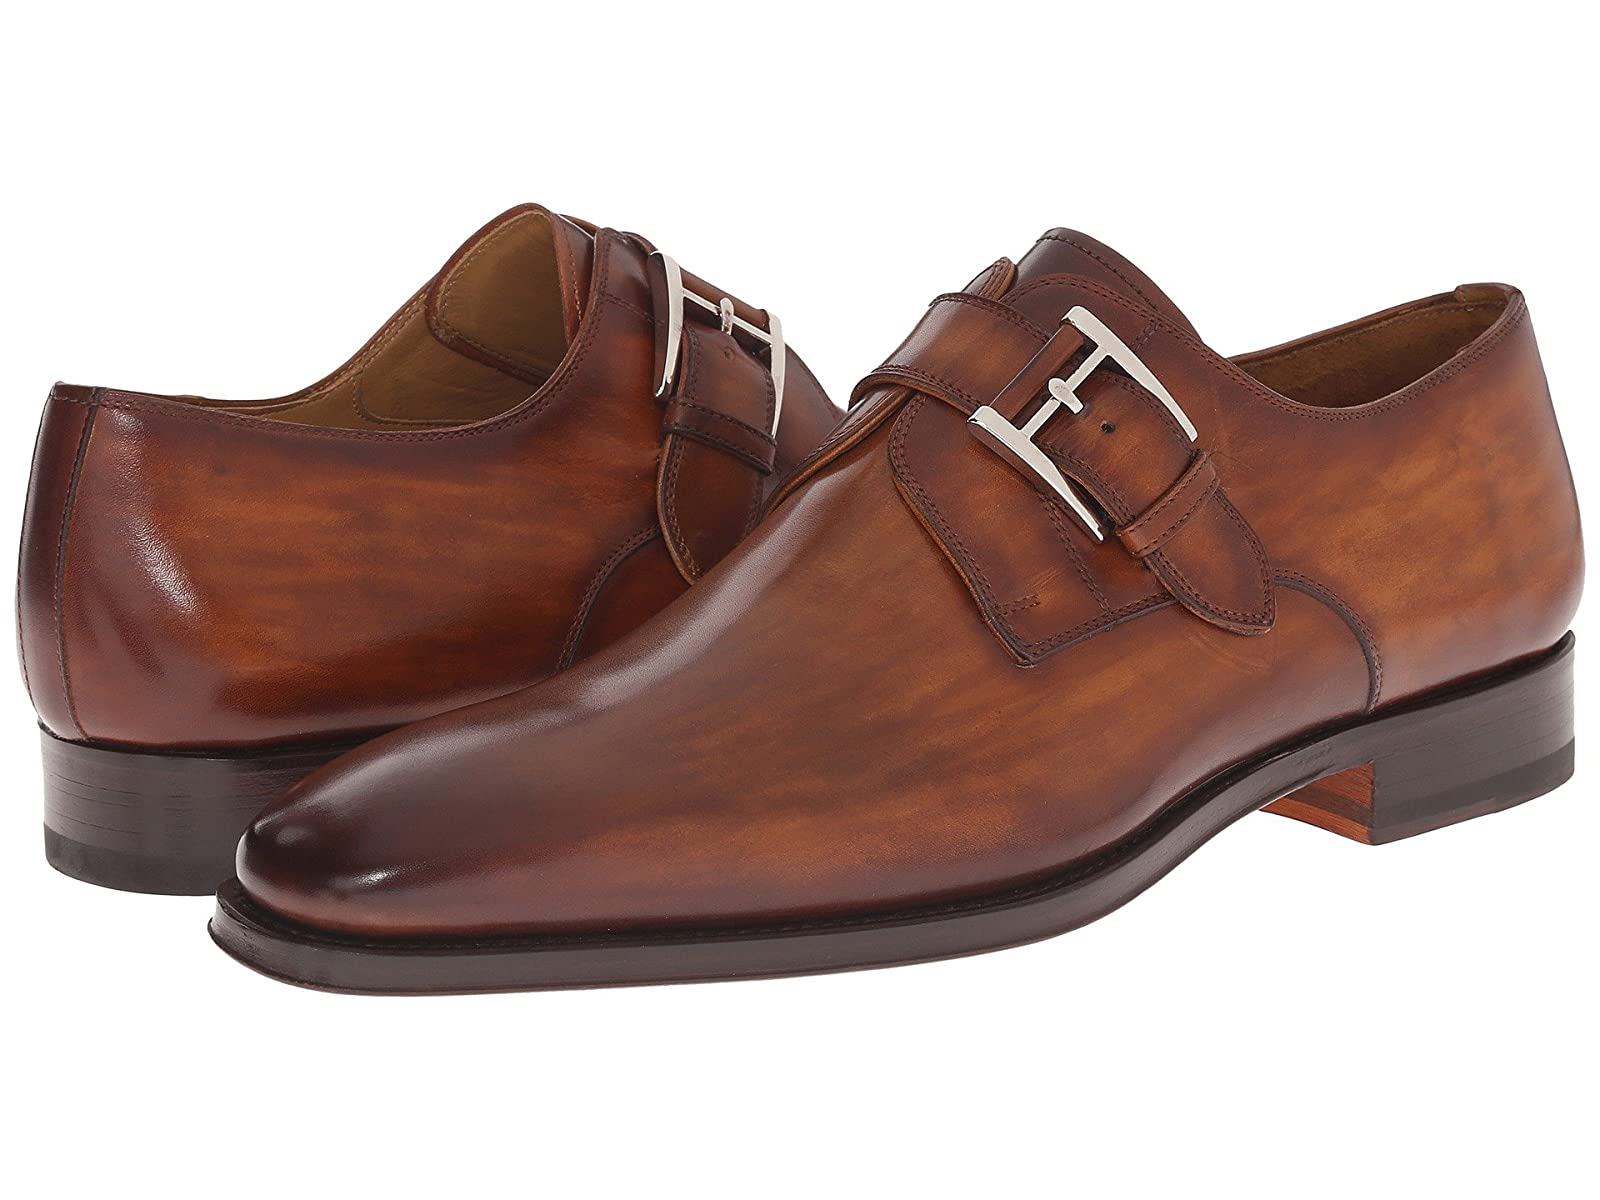 Magnanni MarcoAtmospheric grades have affordable shoes